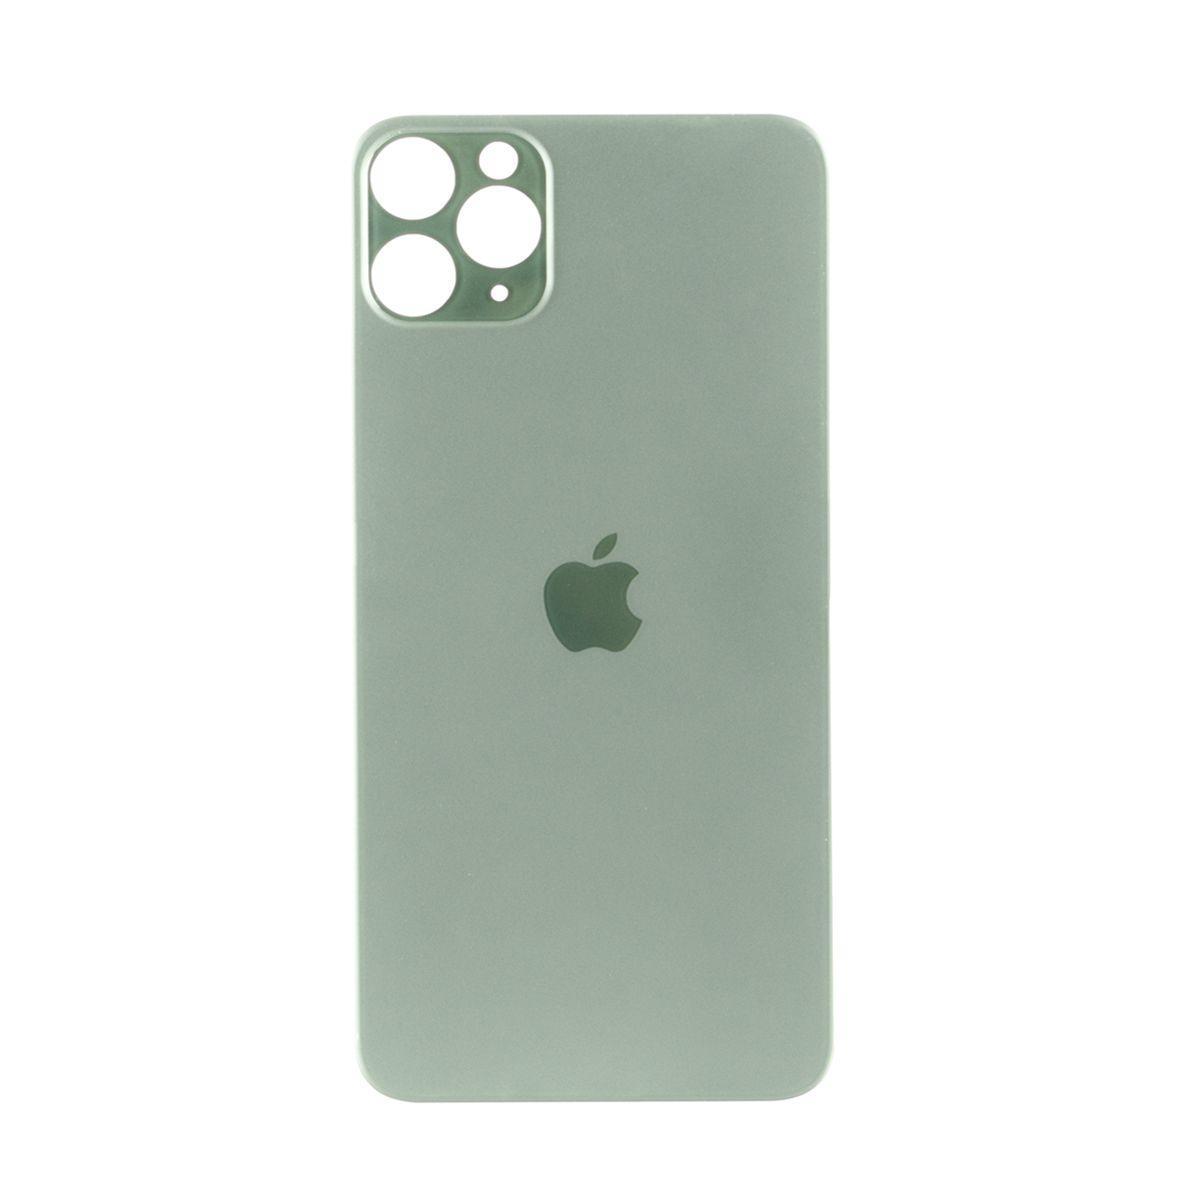 Задняя крышка Apple iPhone 11 Pro Max, Green